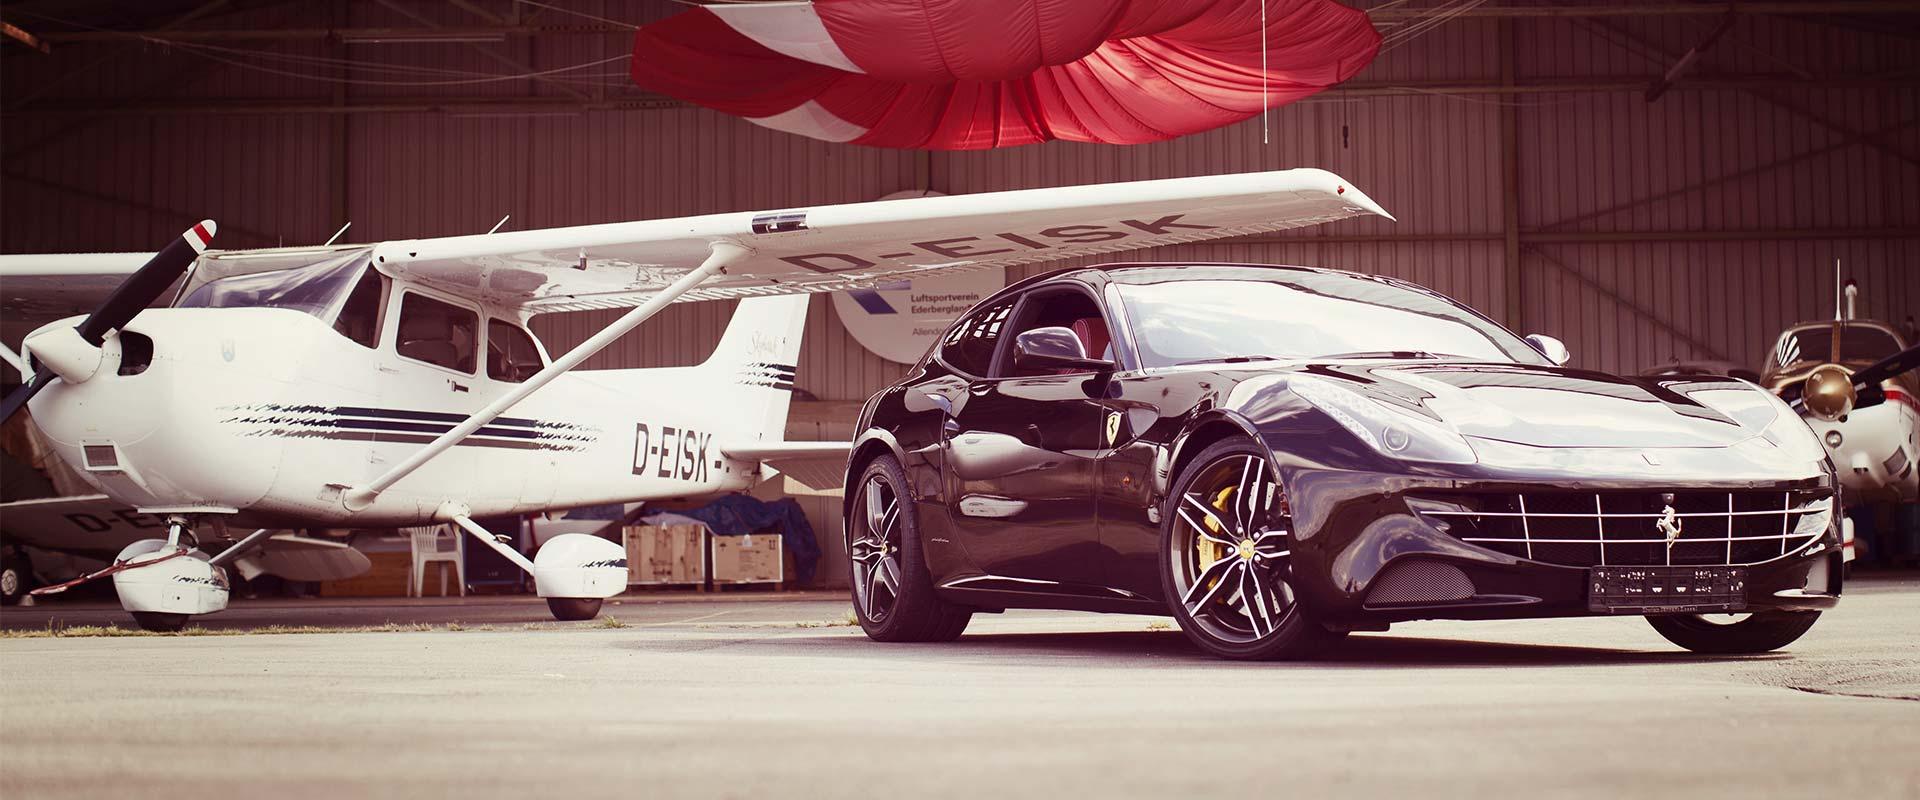 Lackierung Flugzeug Auto Ferrari